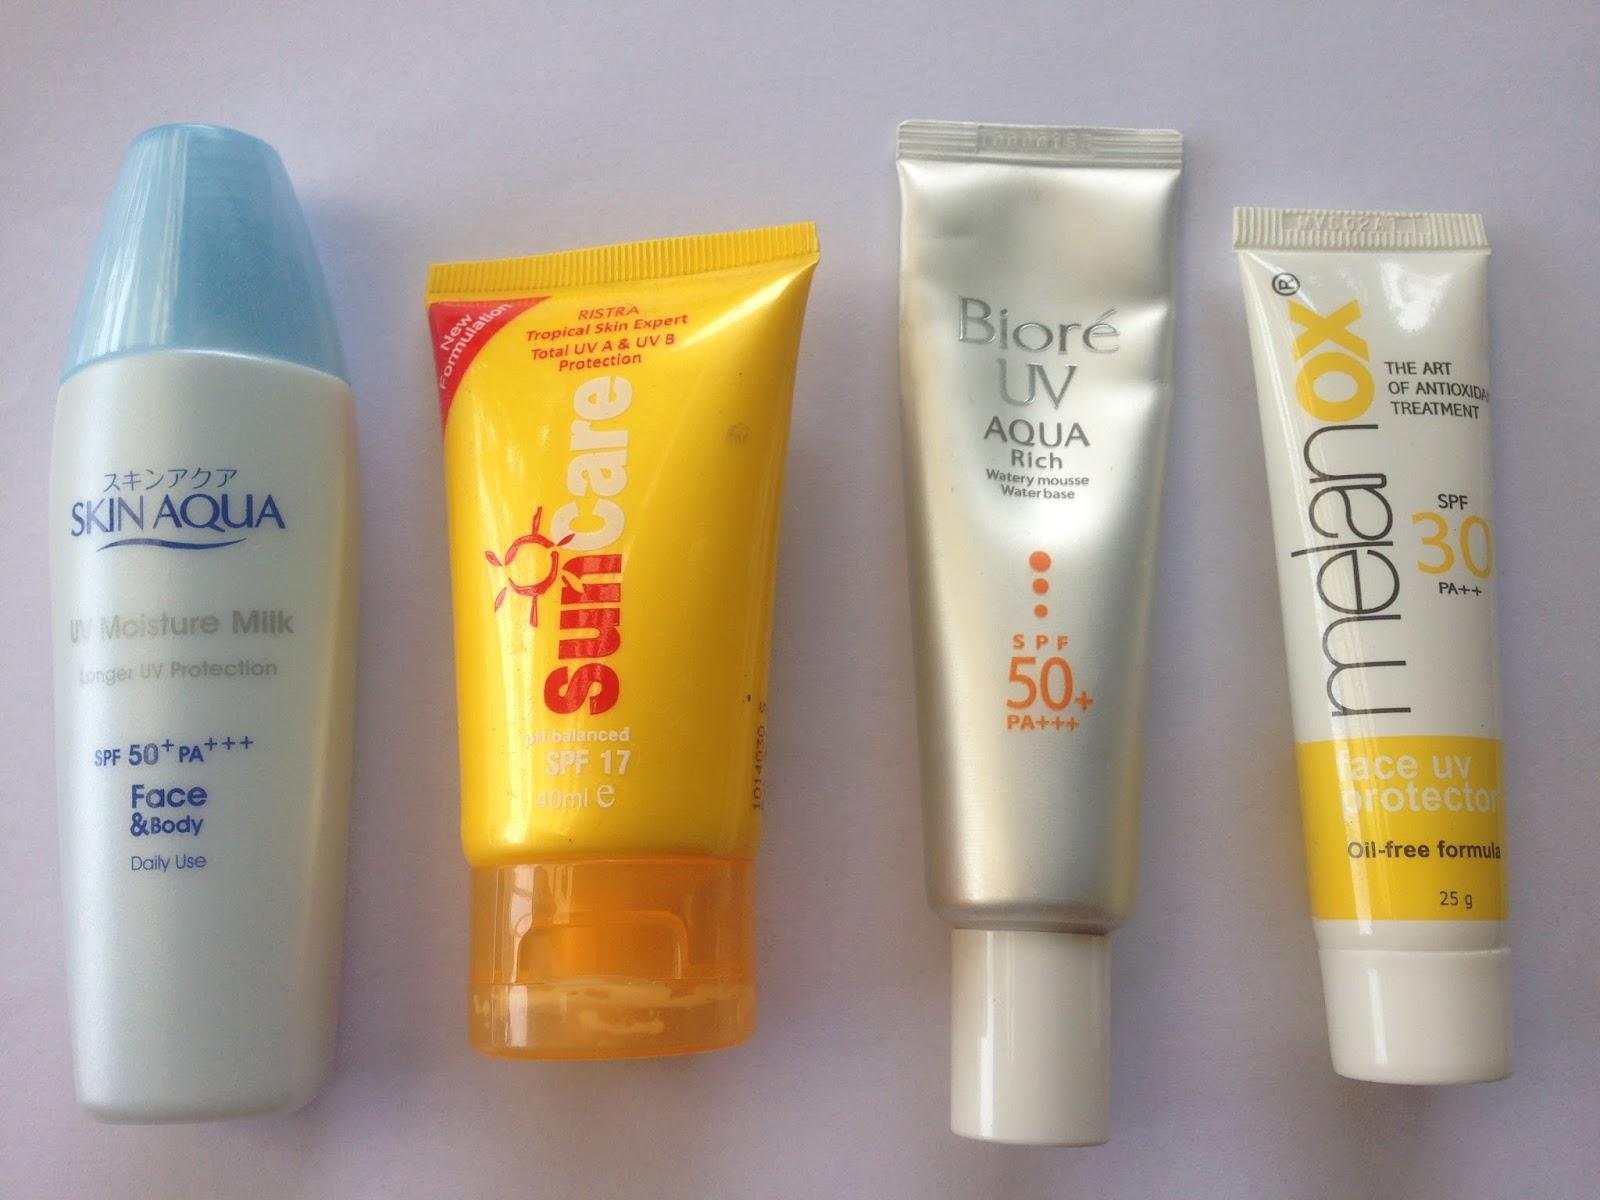 Melanox Face Uv Protector Spf 30 Pa 25g Update Daftar Harga Skin Aqua Moisture Gel 40g From Left To Right Milk 50 Ristra Suncare